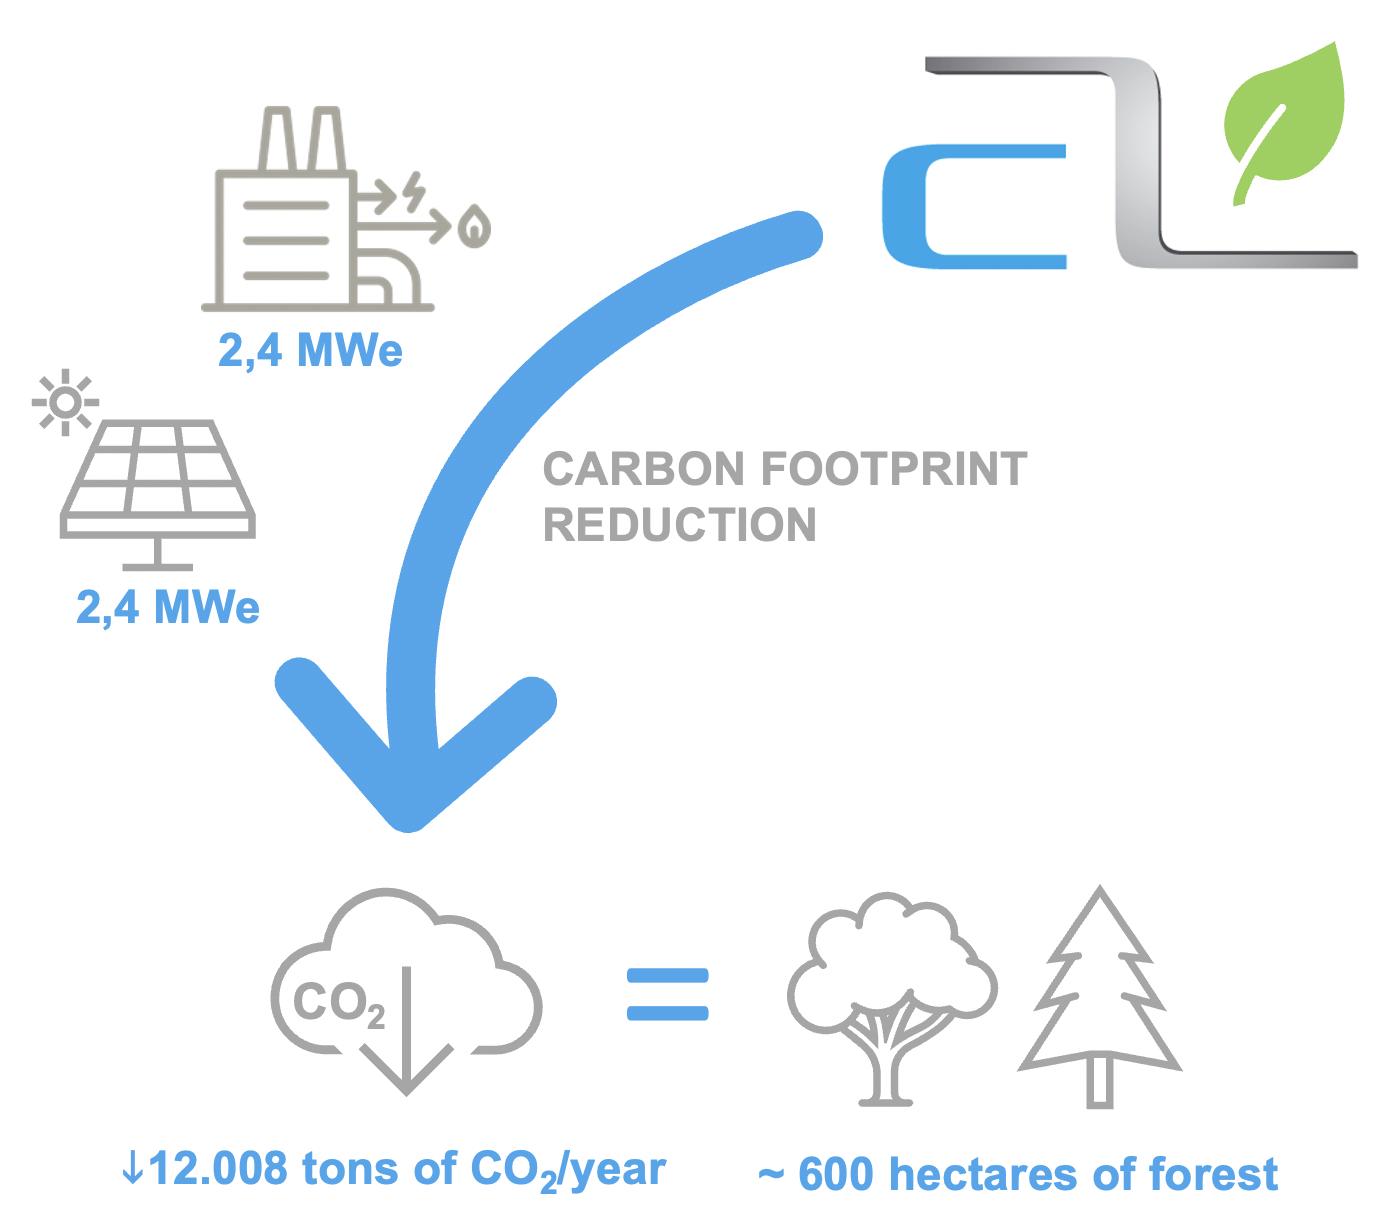 carbon_footprint_reduction_albatros_de